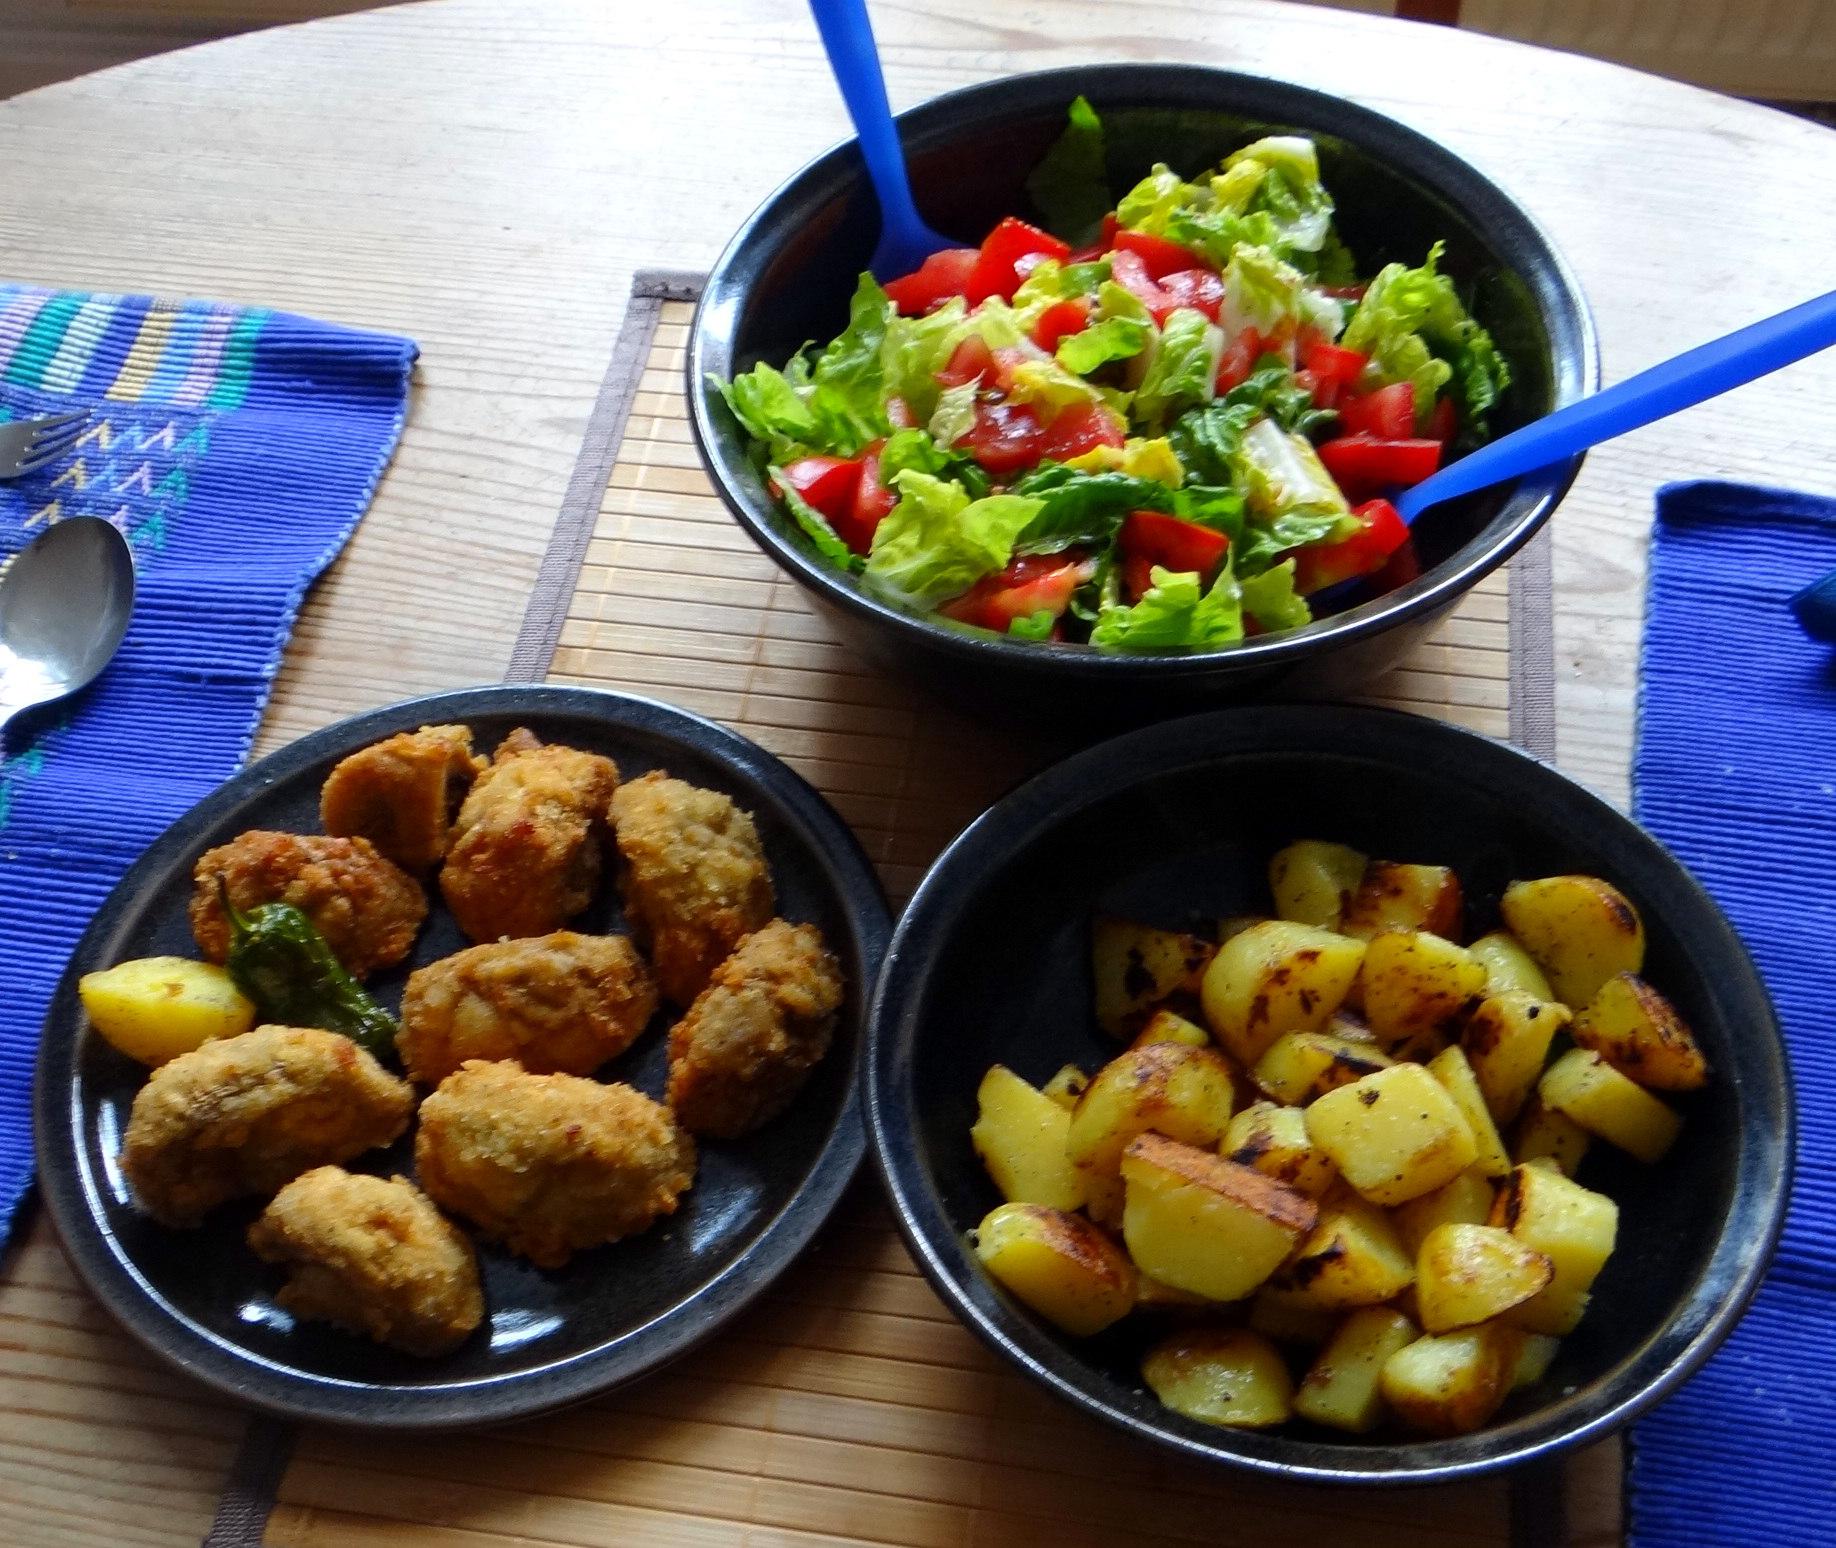 Fritierte Portobello,Bratkartoffeln,Pimientos,Salat,vegan (17)